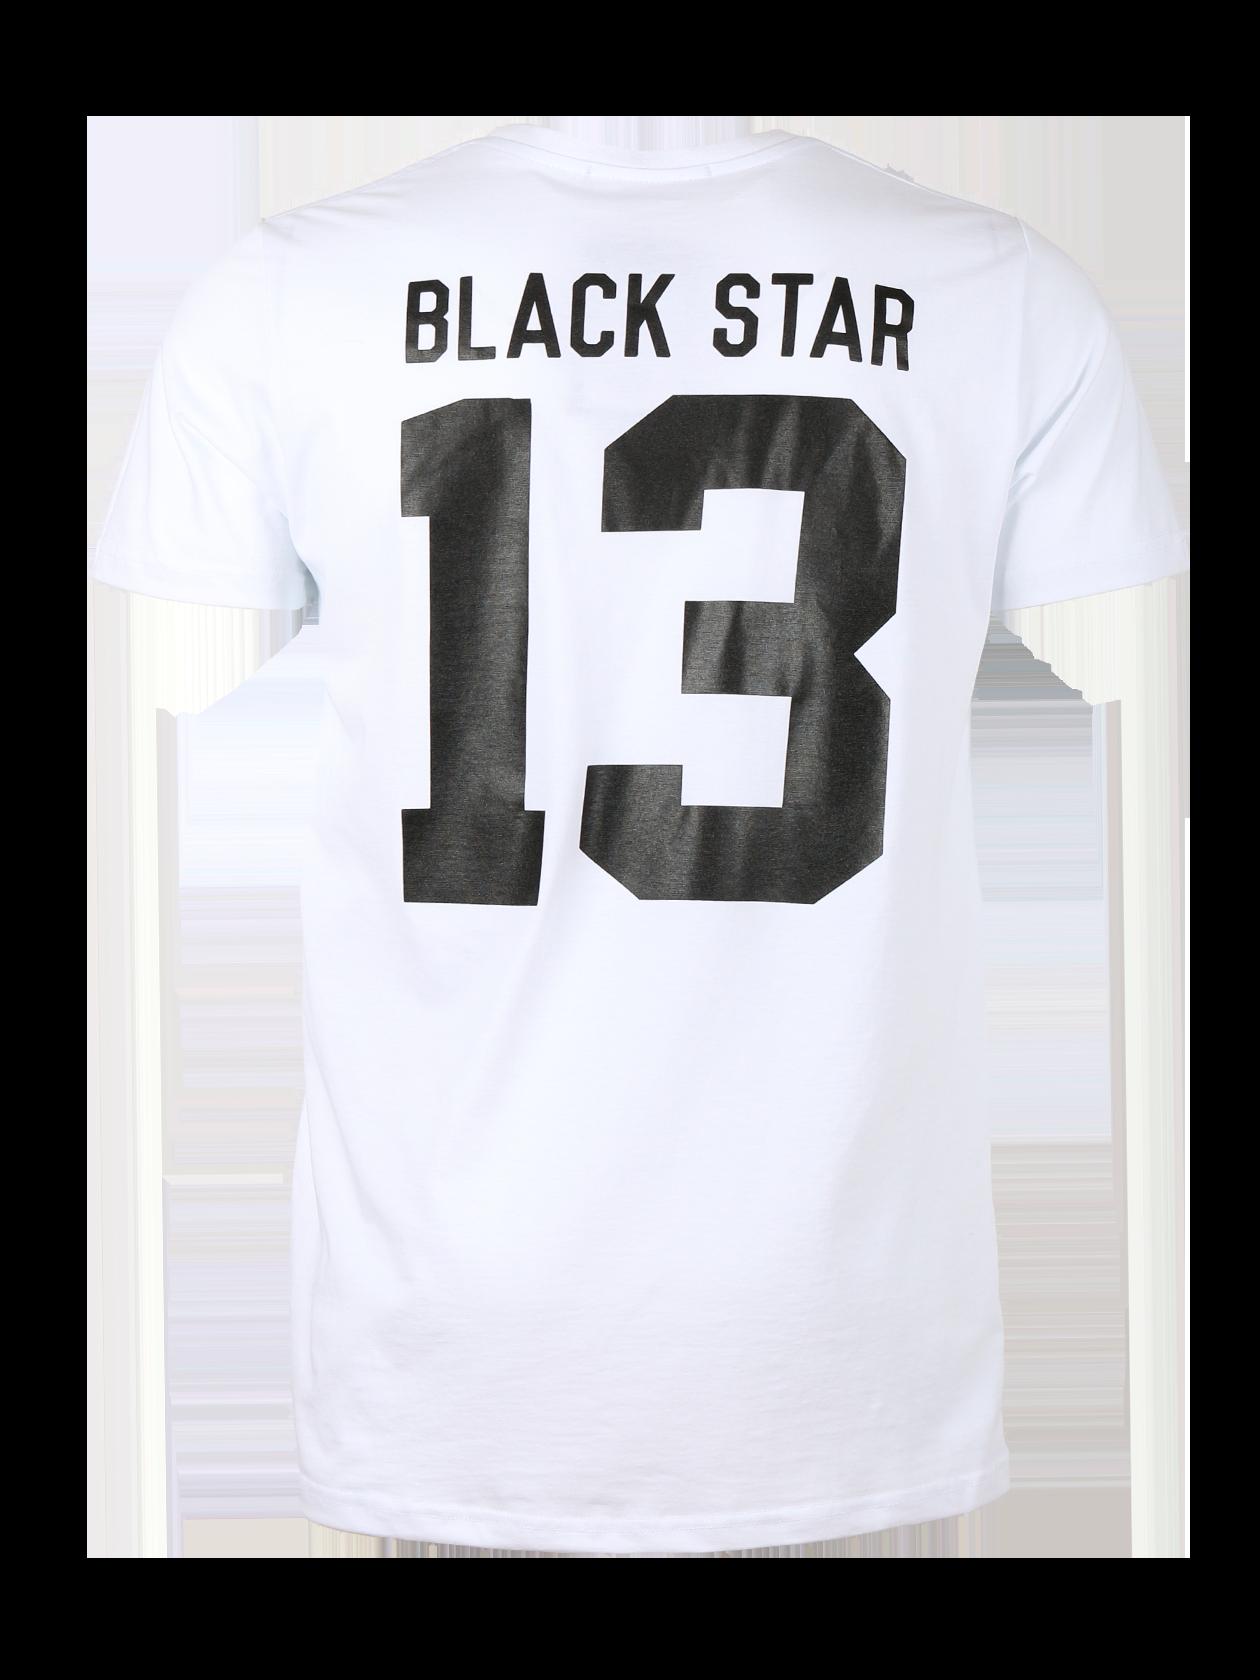 Футболка унисекс Anchor от Black Star Wear